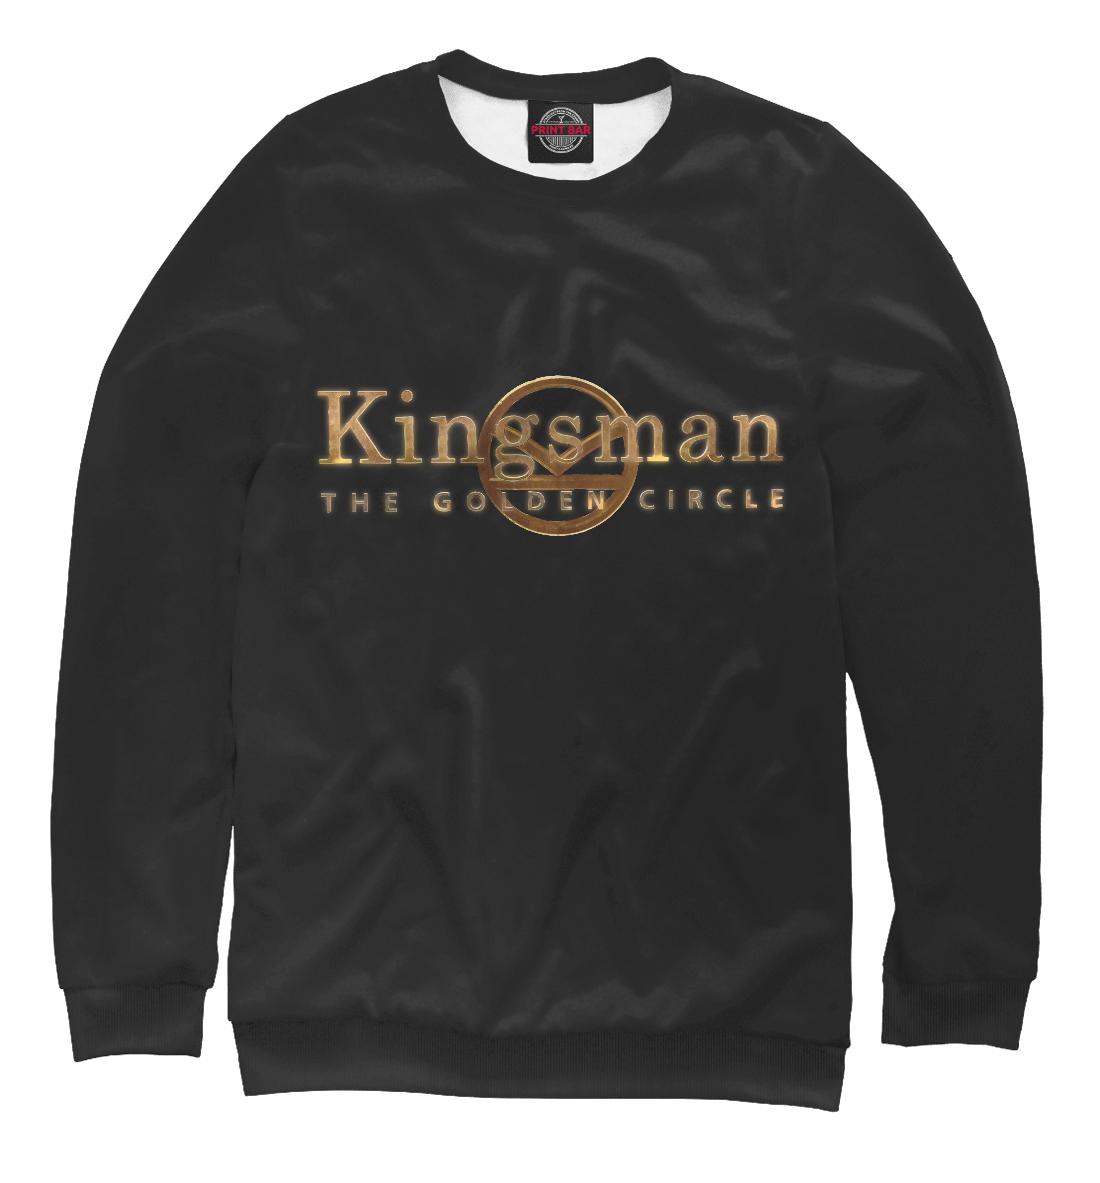 Купить Kingsman: Золотое кольцо, Printbar, Свитшоты, KNO-468355-swi-2